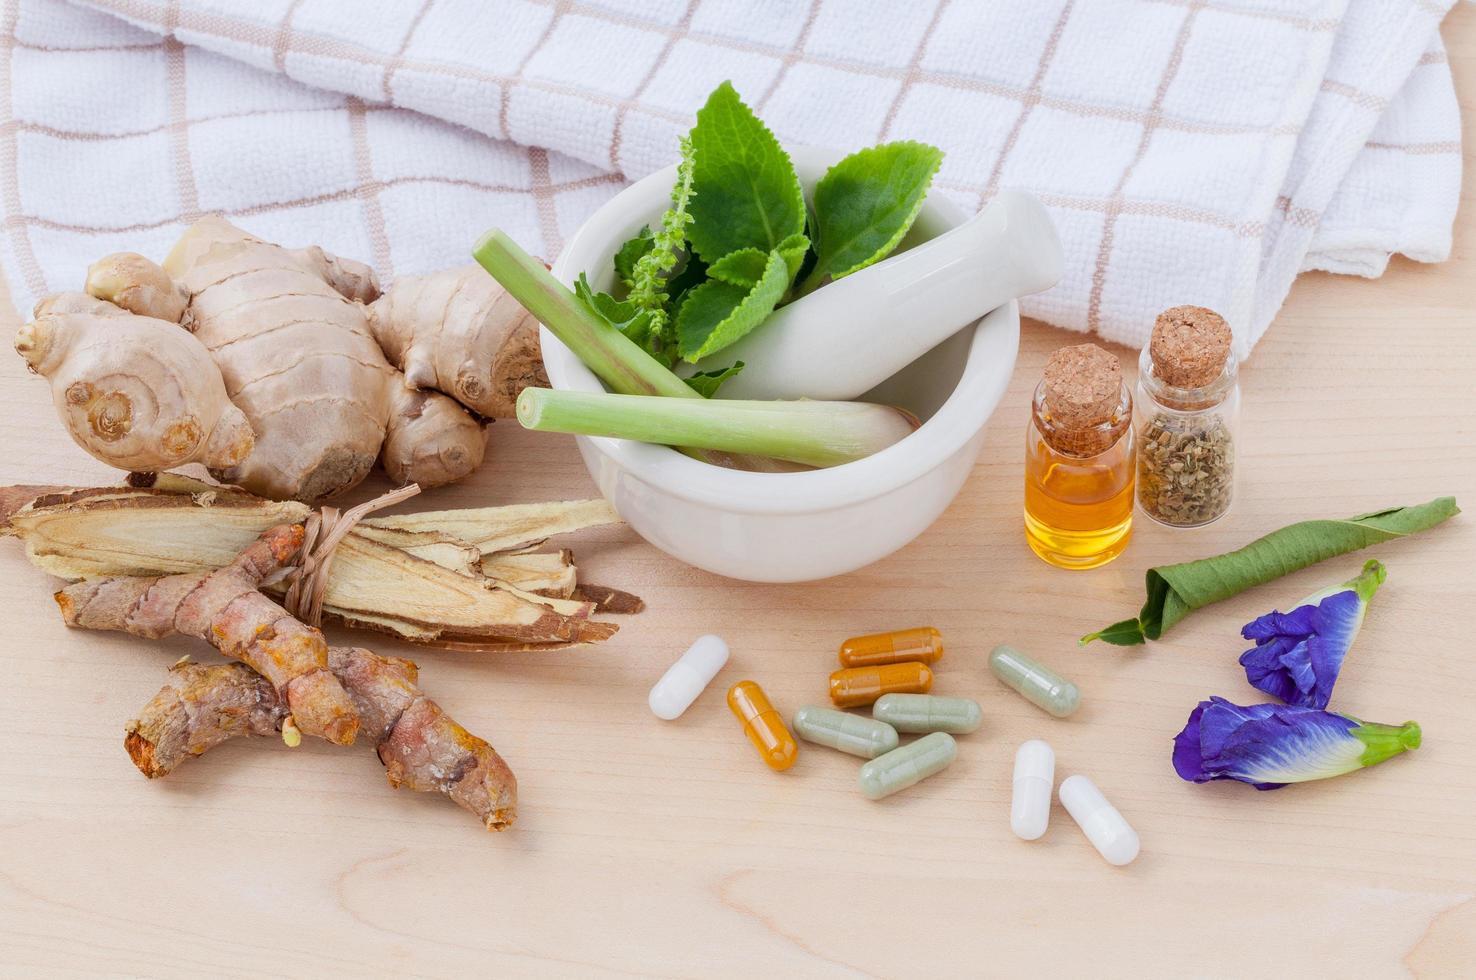 medicina herbal fresca foto